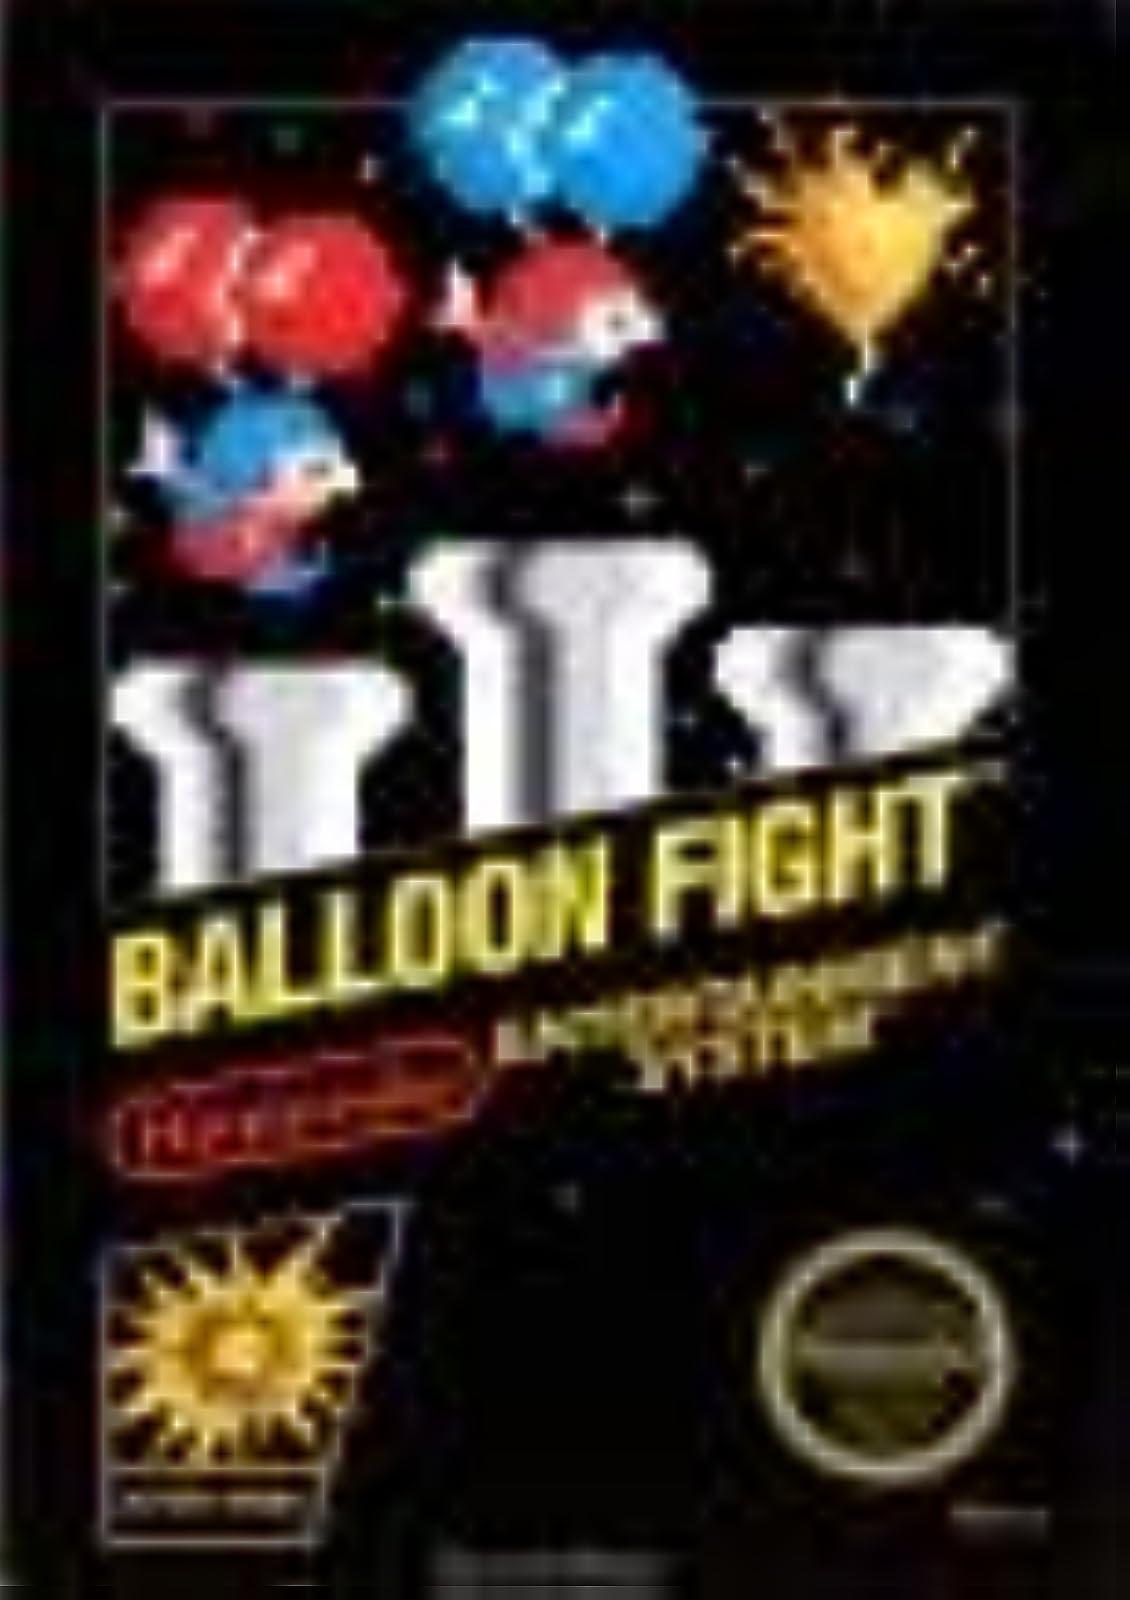 Balloon Fight For Nintendo NES Vintage